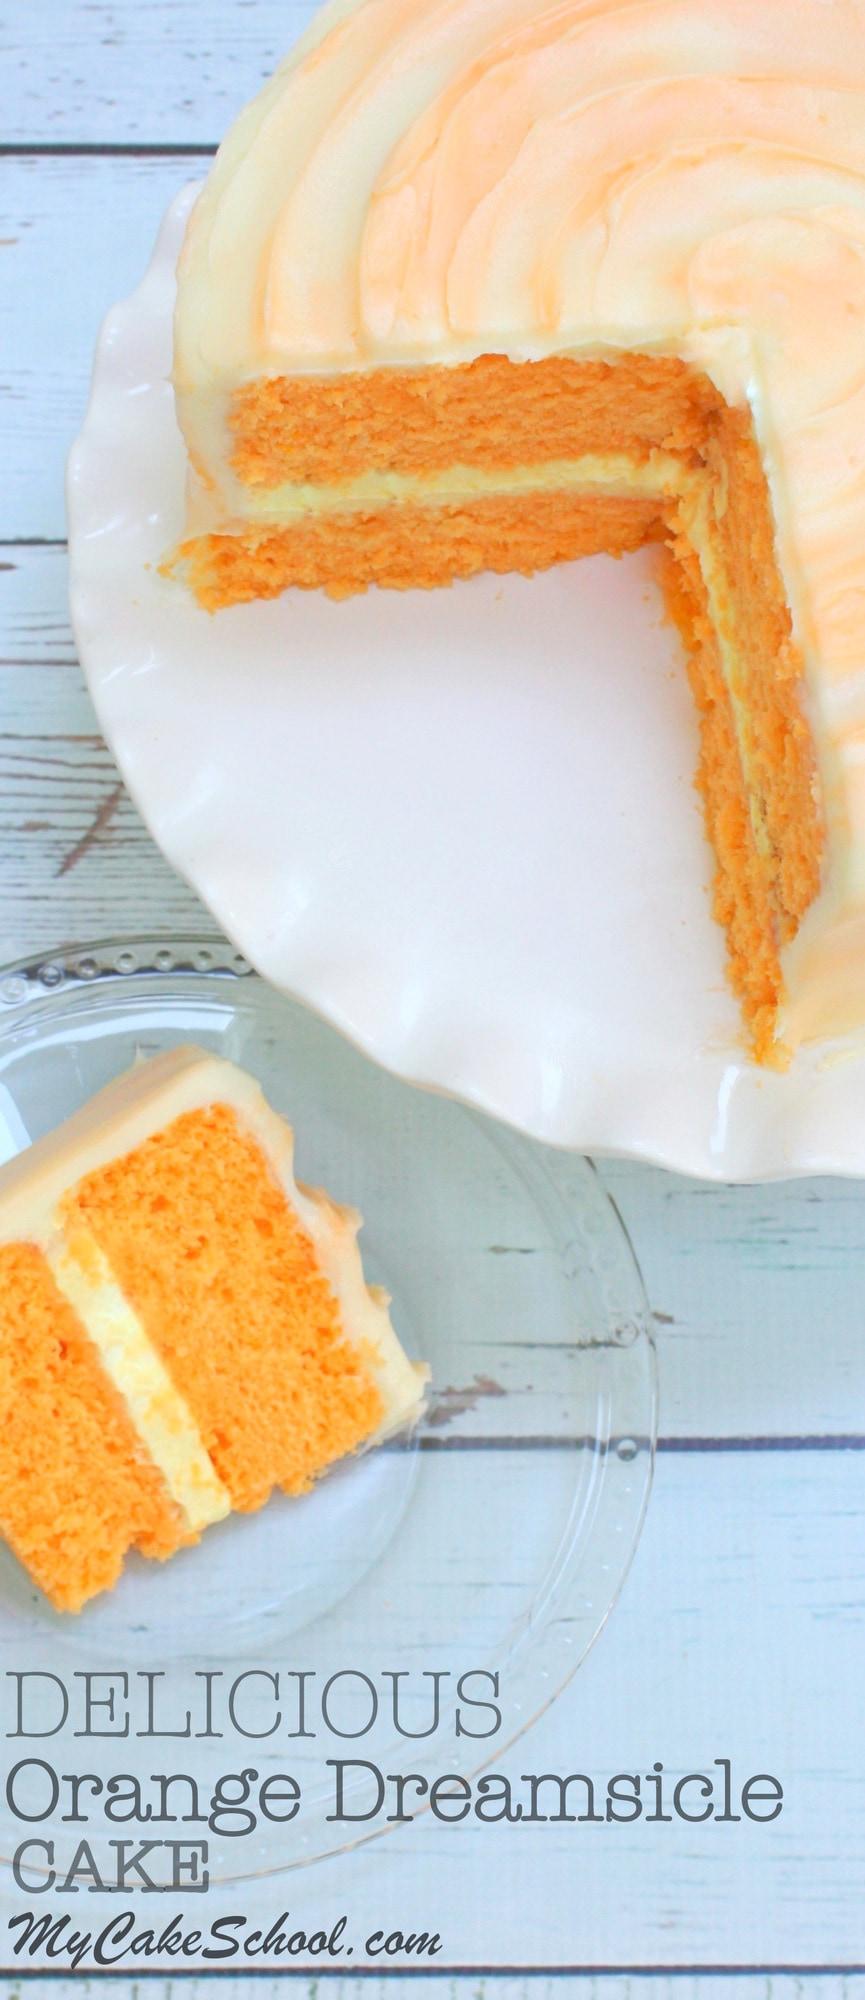 Orange Dreamsicle Cake Delicious Homemade Recipe My